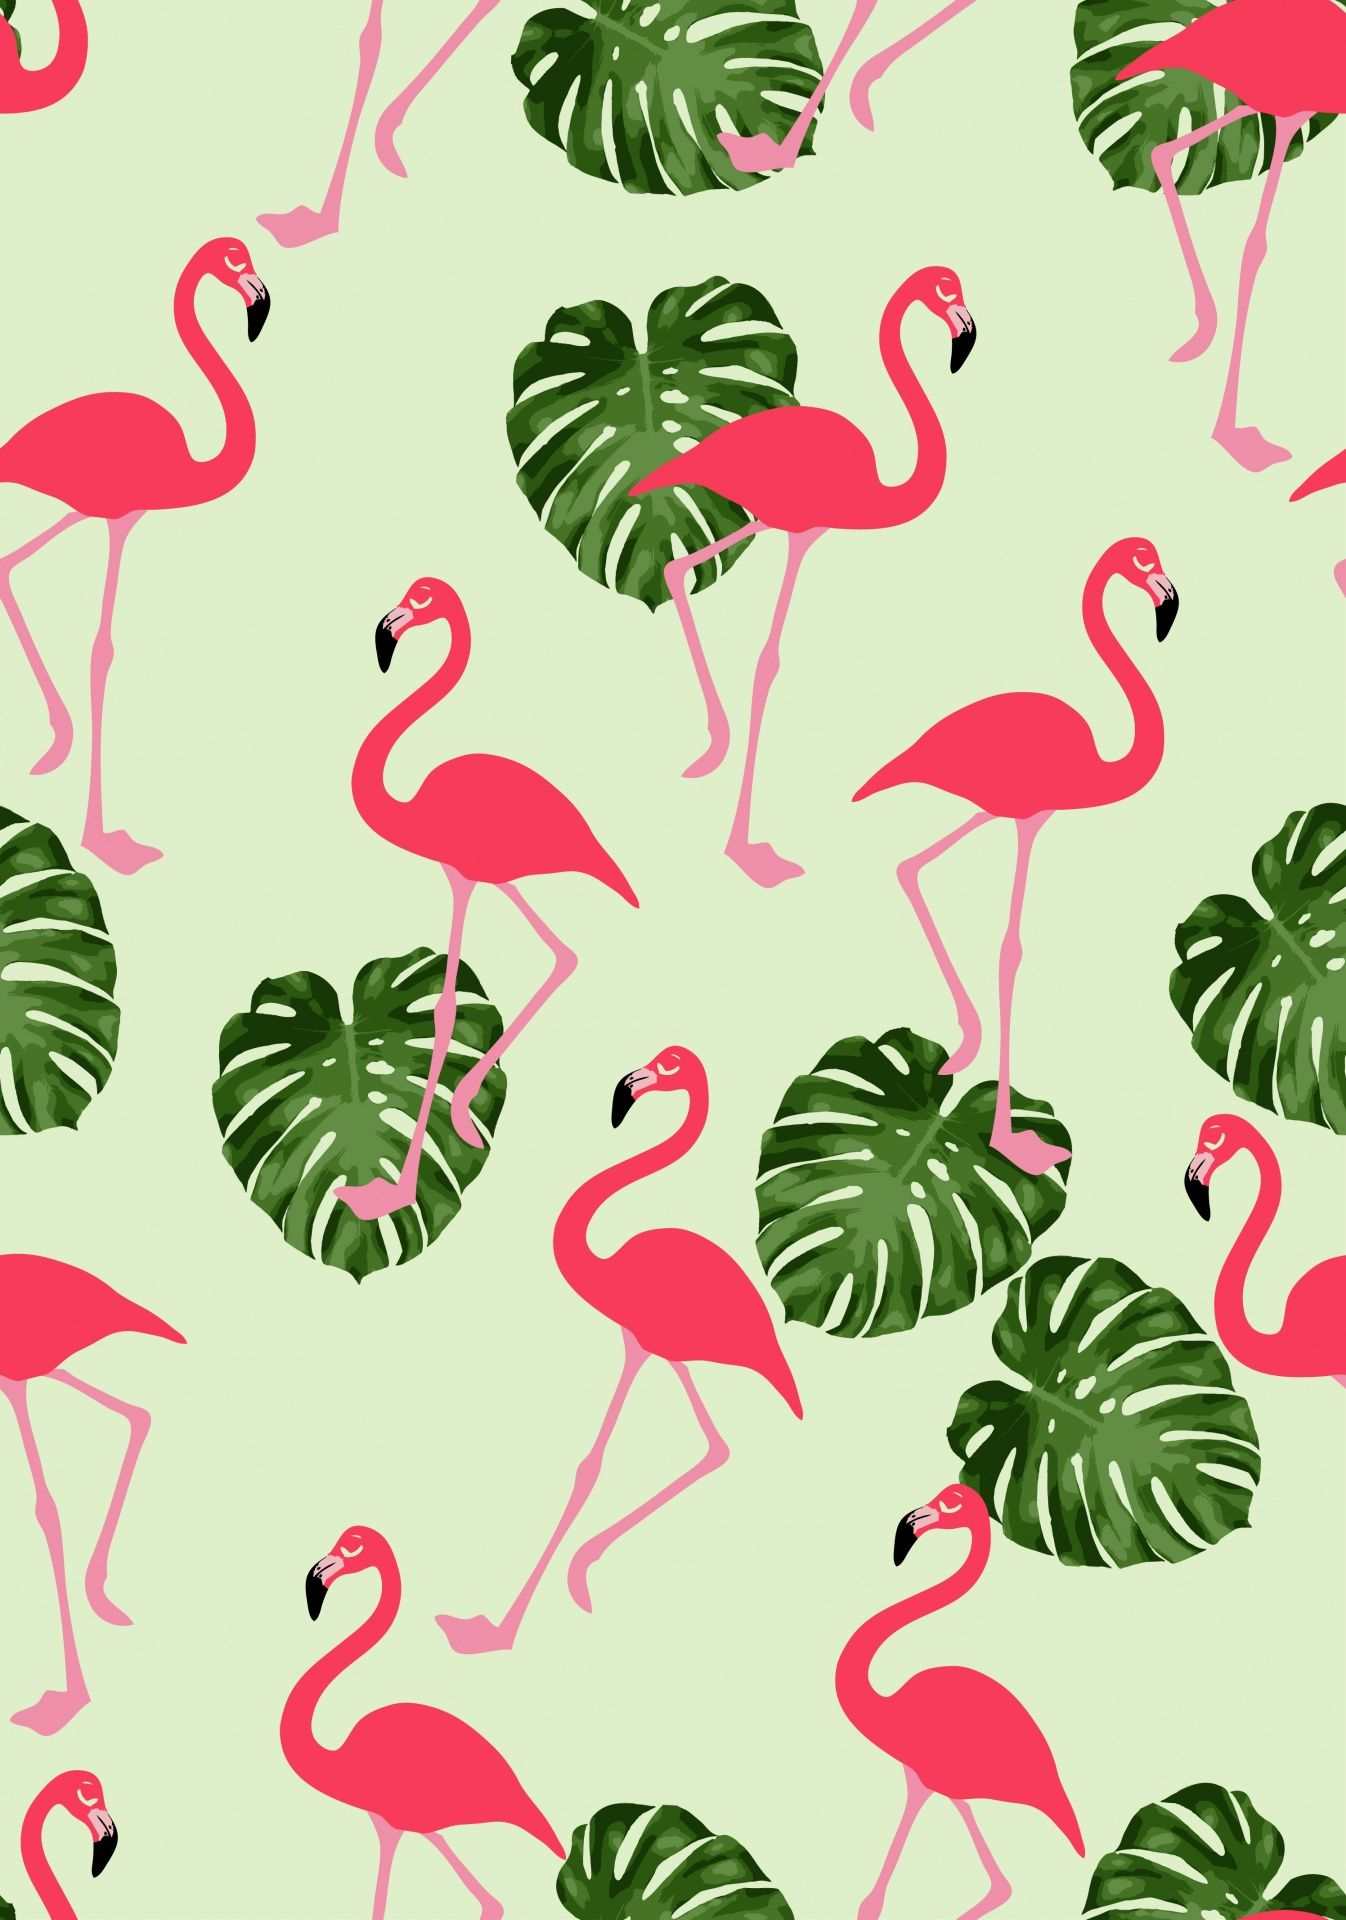 Flamingo Wallpapers Top Free Flamingo Backgrounds